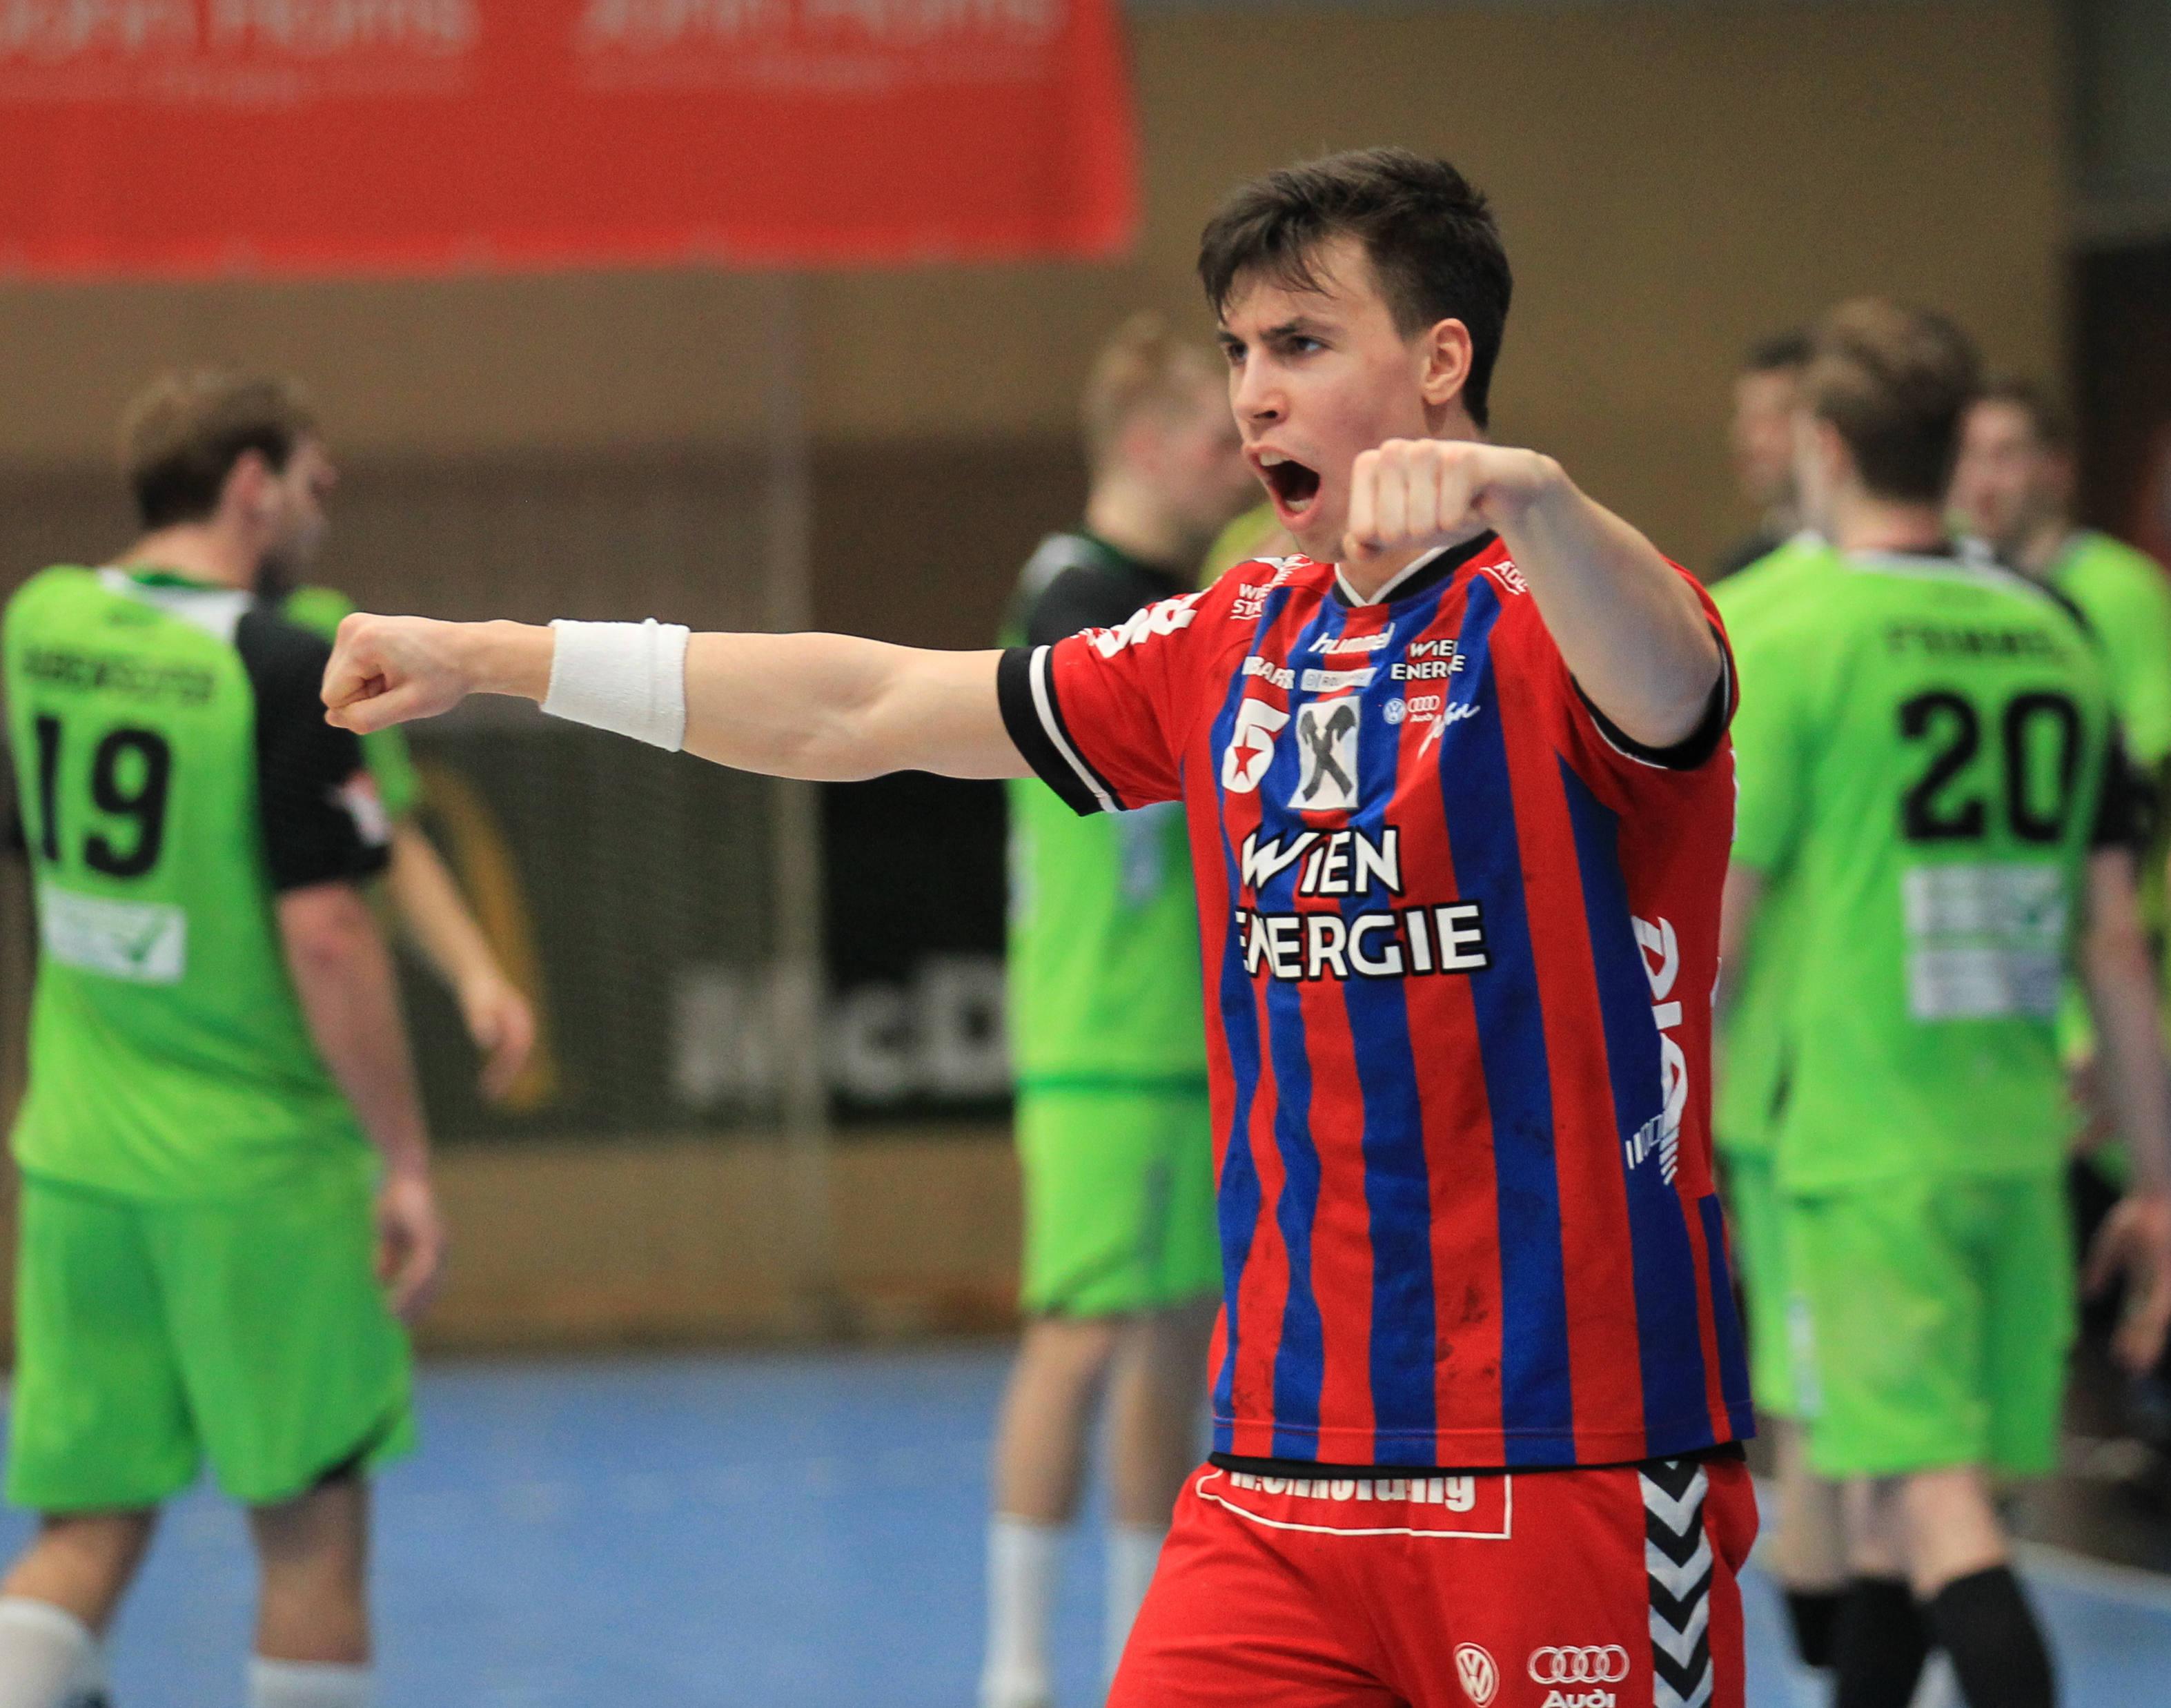 11.03.2017 Handball, Hollgasse, Wien, HLA Fivers Margareten - West Wien Jubel, Ivan MARTINOVIC, Copyright DIENER / Eva Manhart www.diener.at